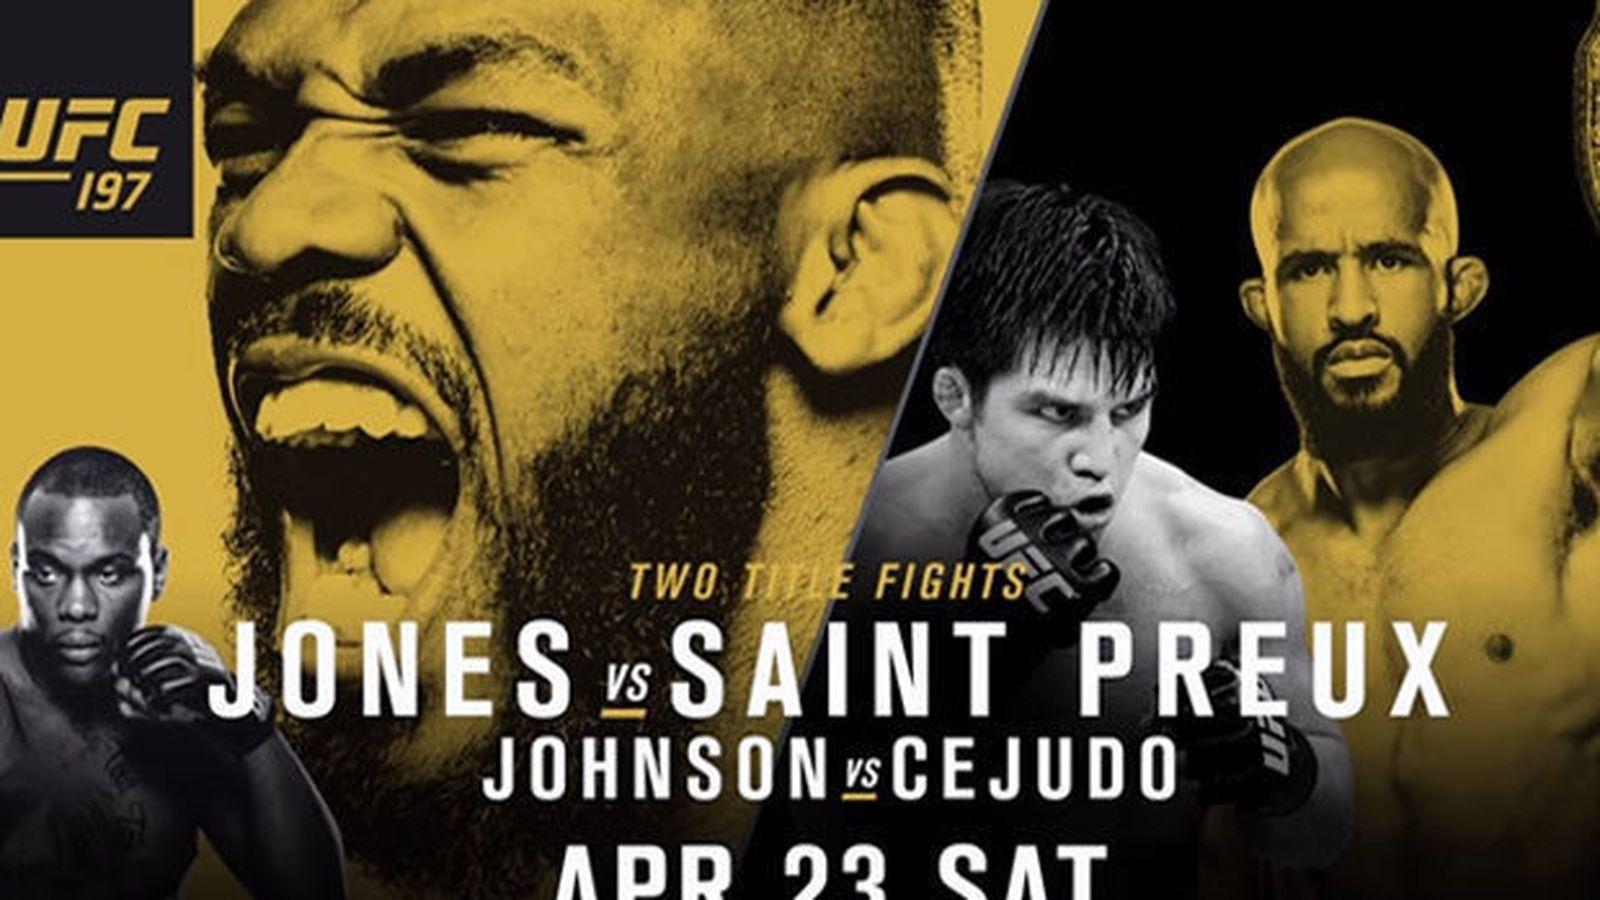 UFC_197_2_0_0.jpg